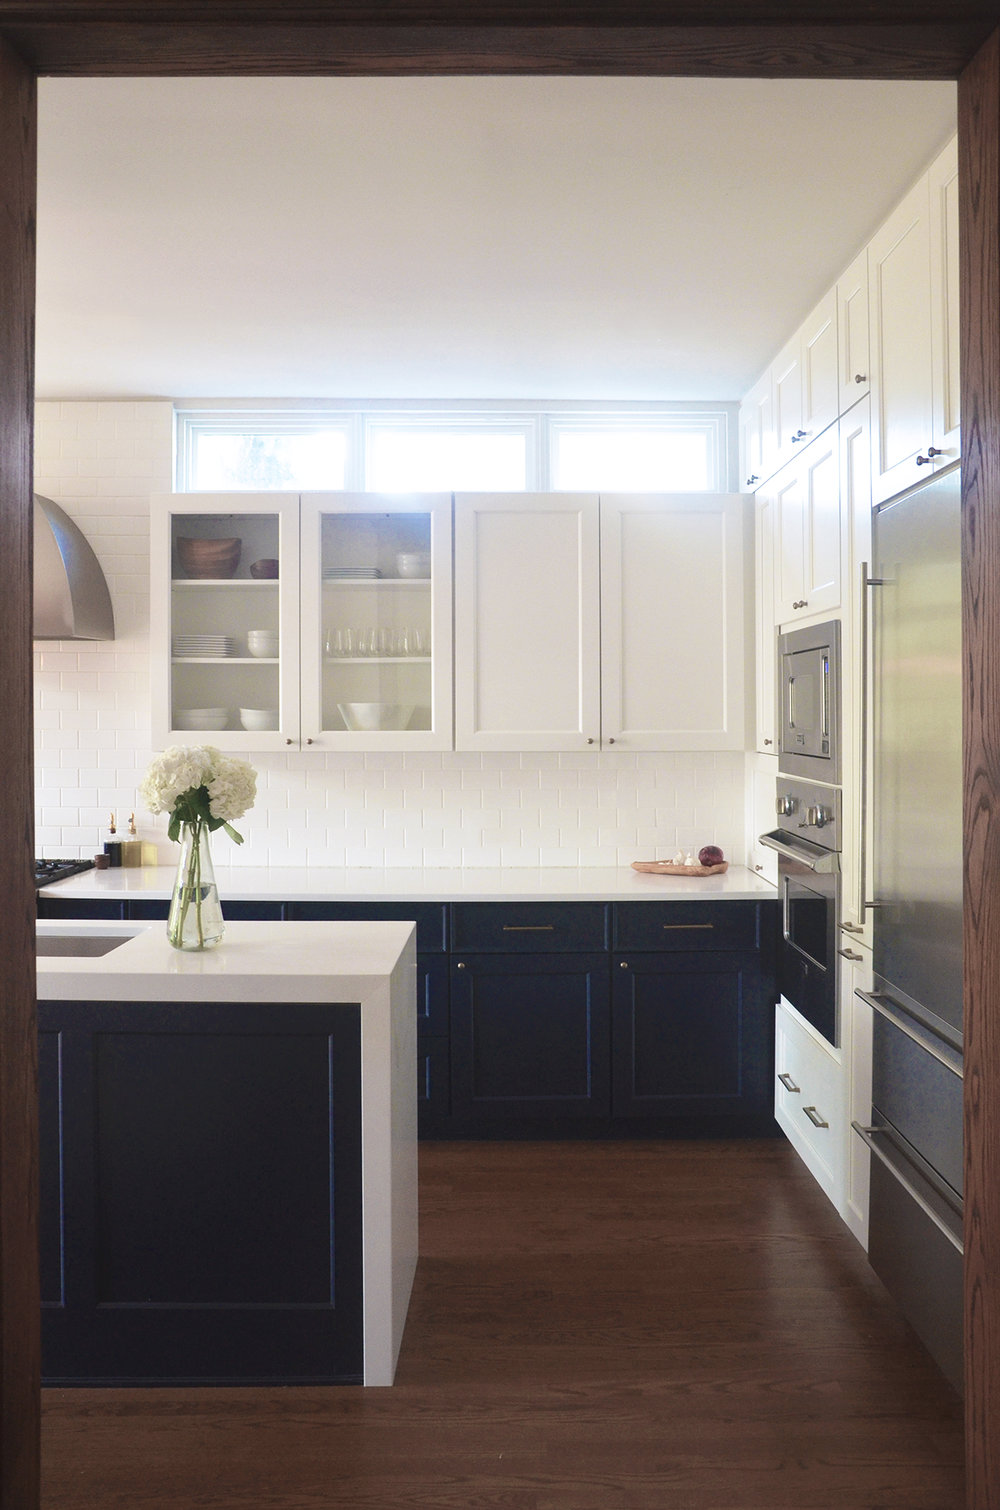 debaun studio_Irving Park Kitchen_View 1.jpg